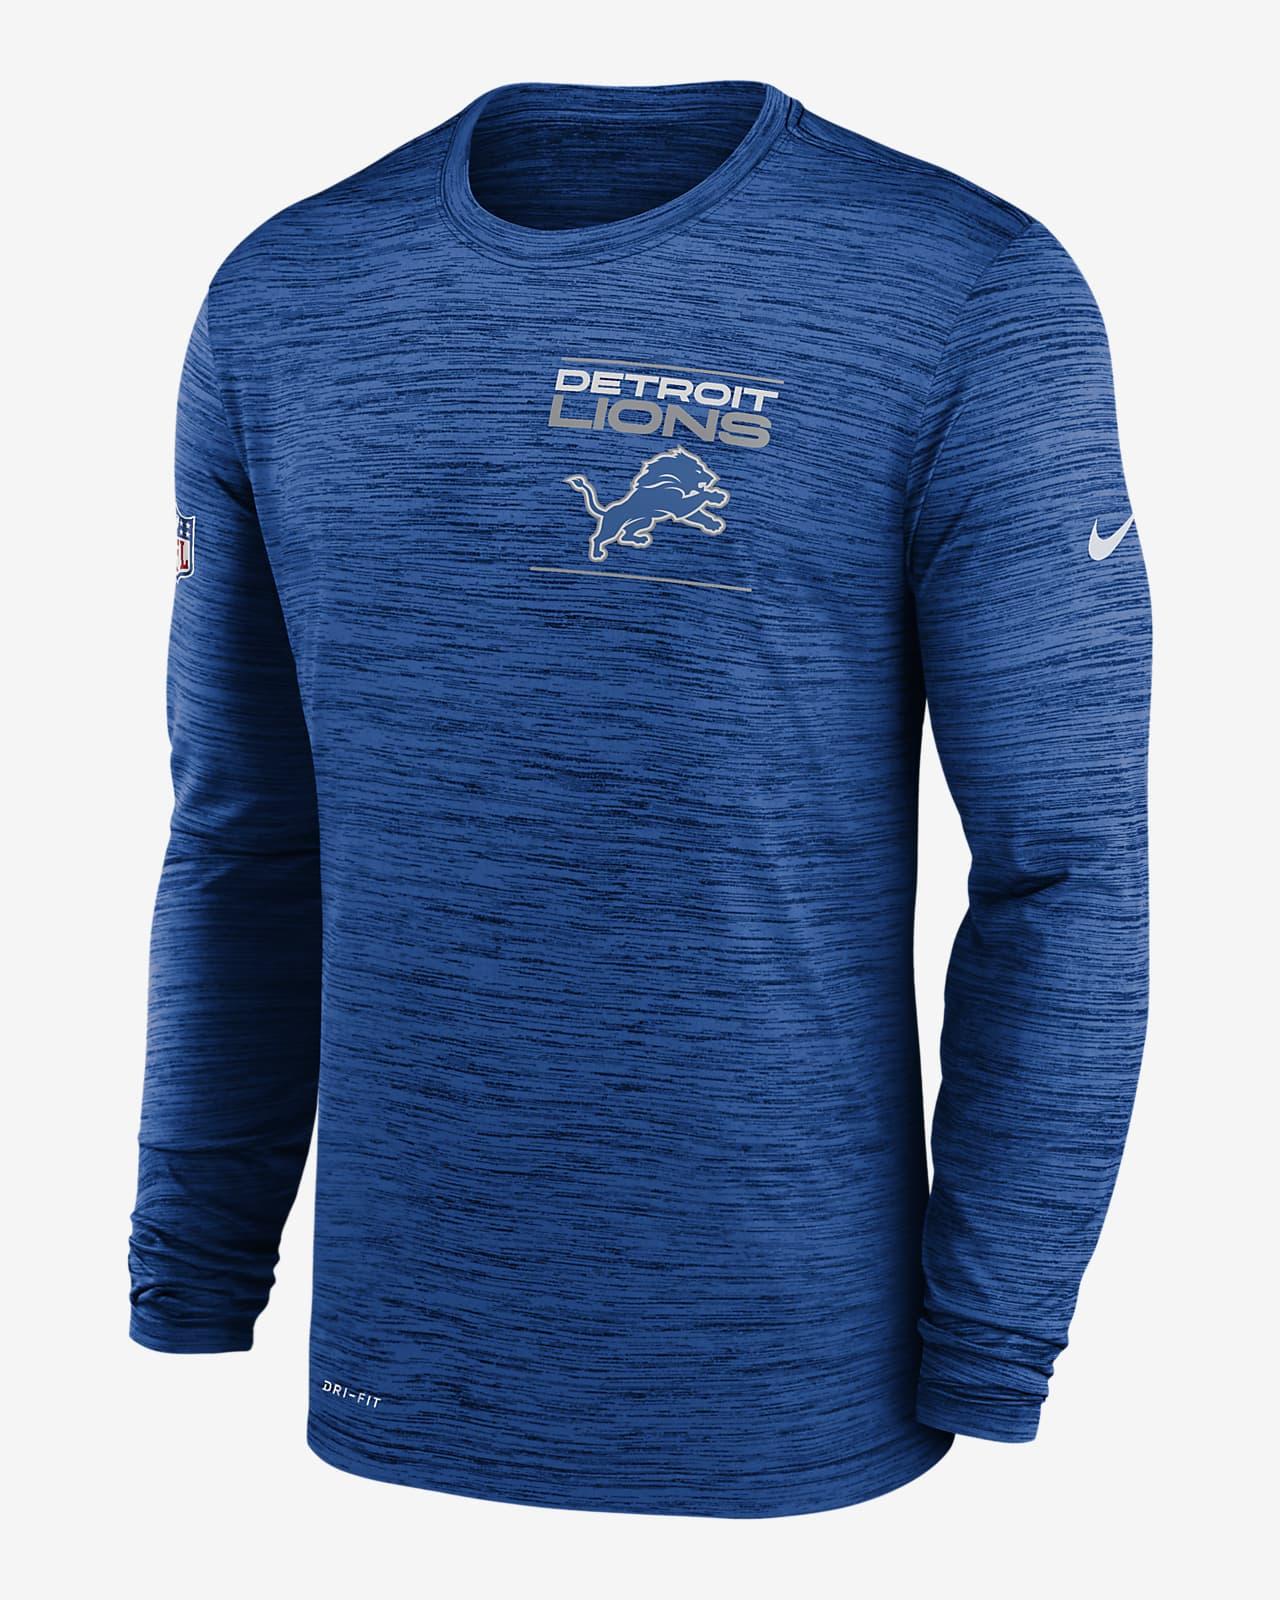 Nike Dri-FIT Sideline Velocity Legend (NFL Detroit Lions) Men's Long-Sleeve T-Shirt